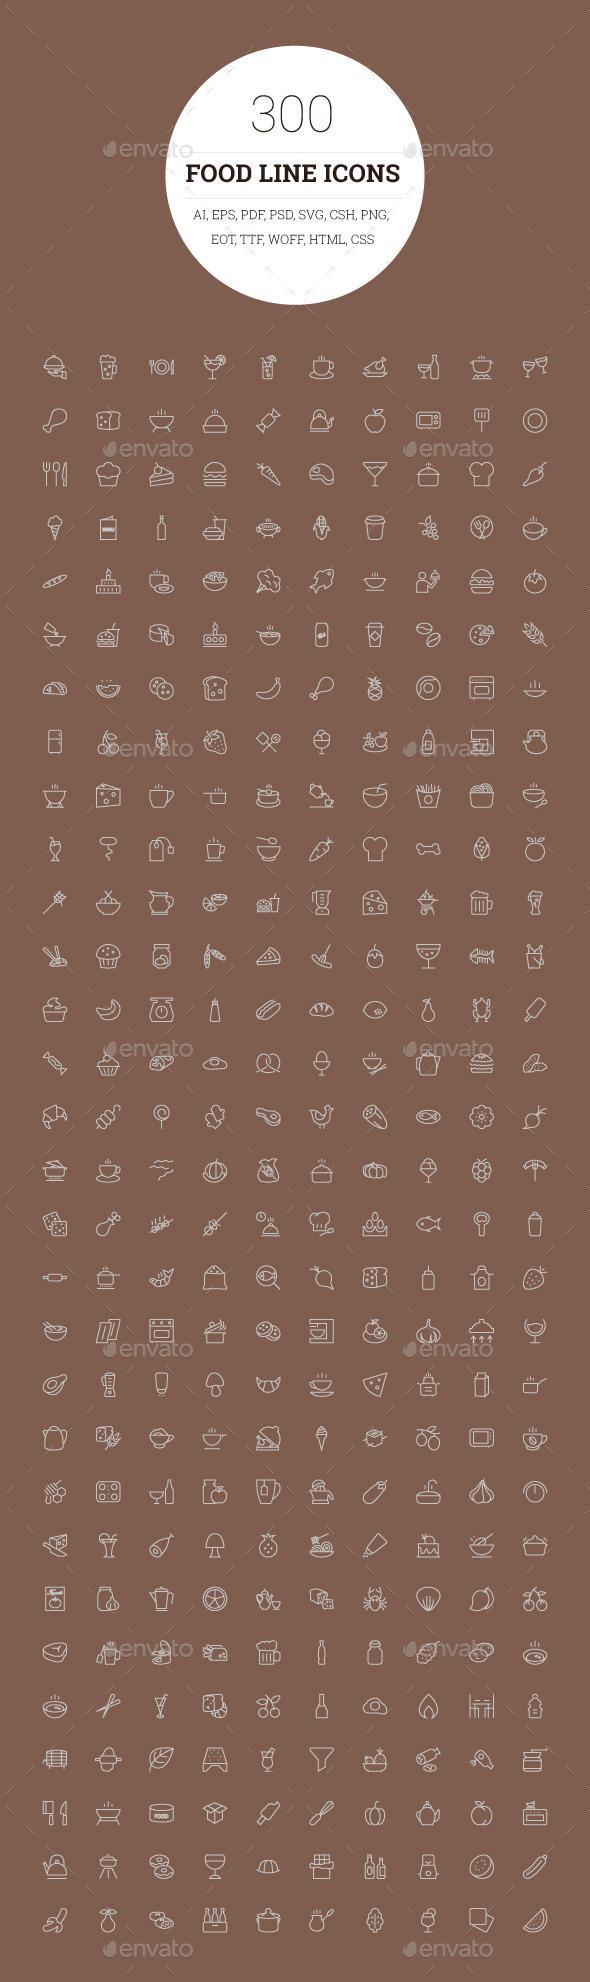 300 Food Line Icons Line icon, Food icons, Restaurant icon